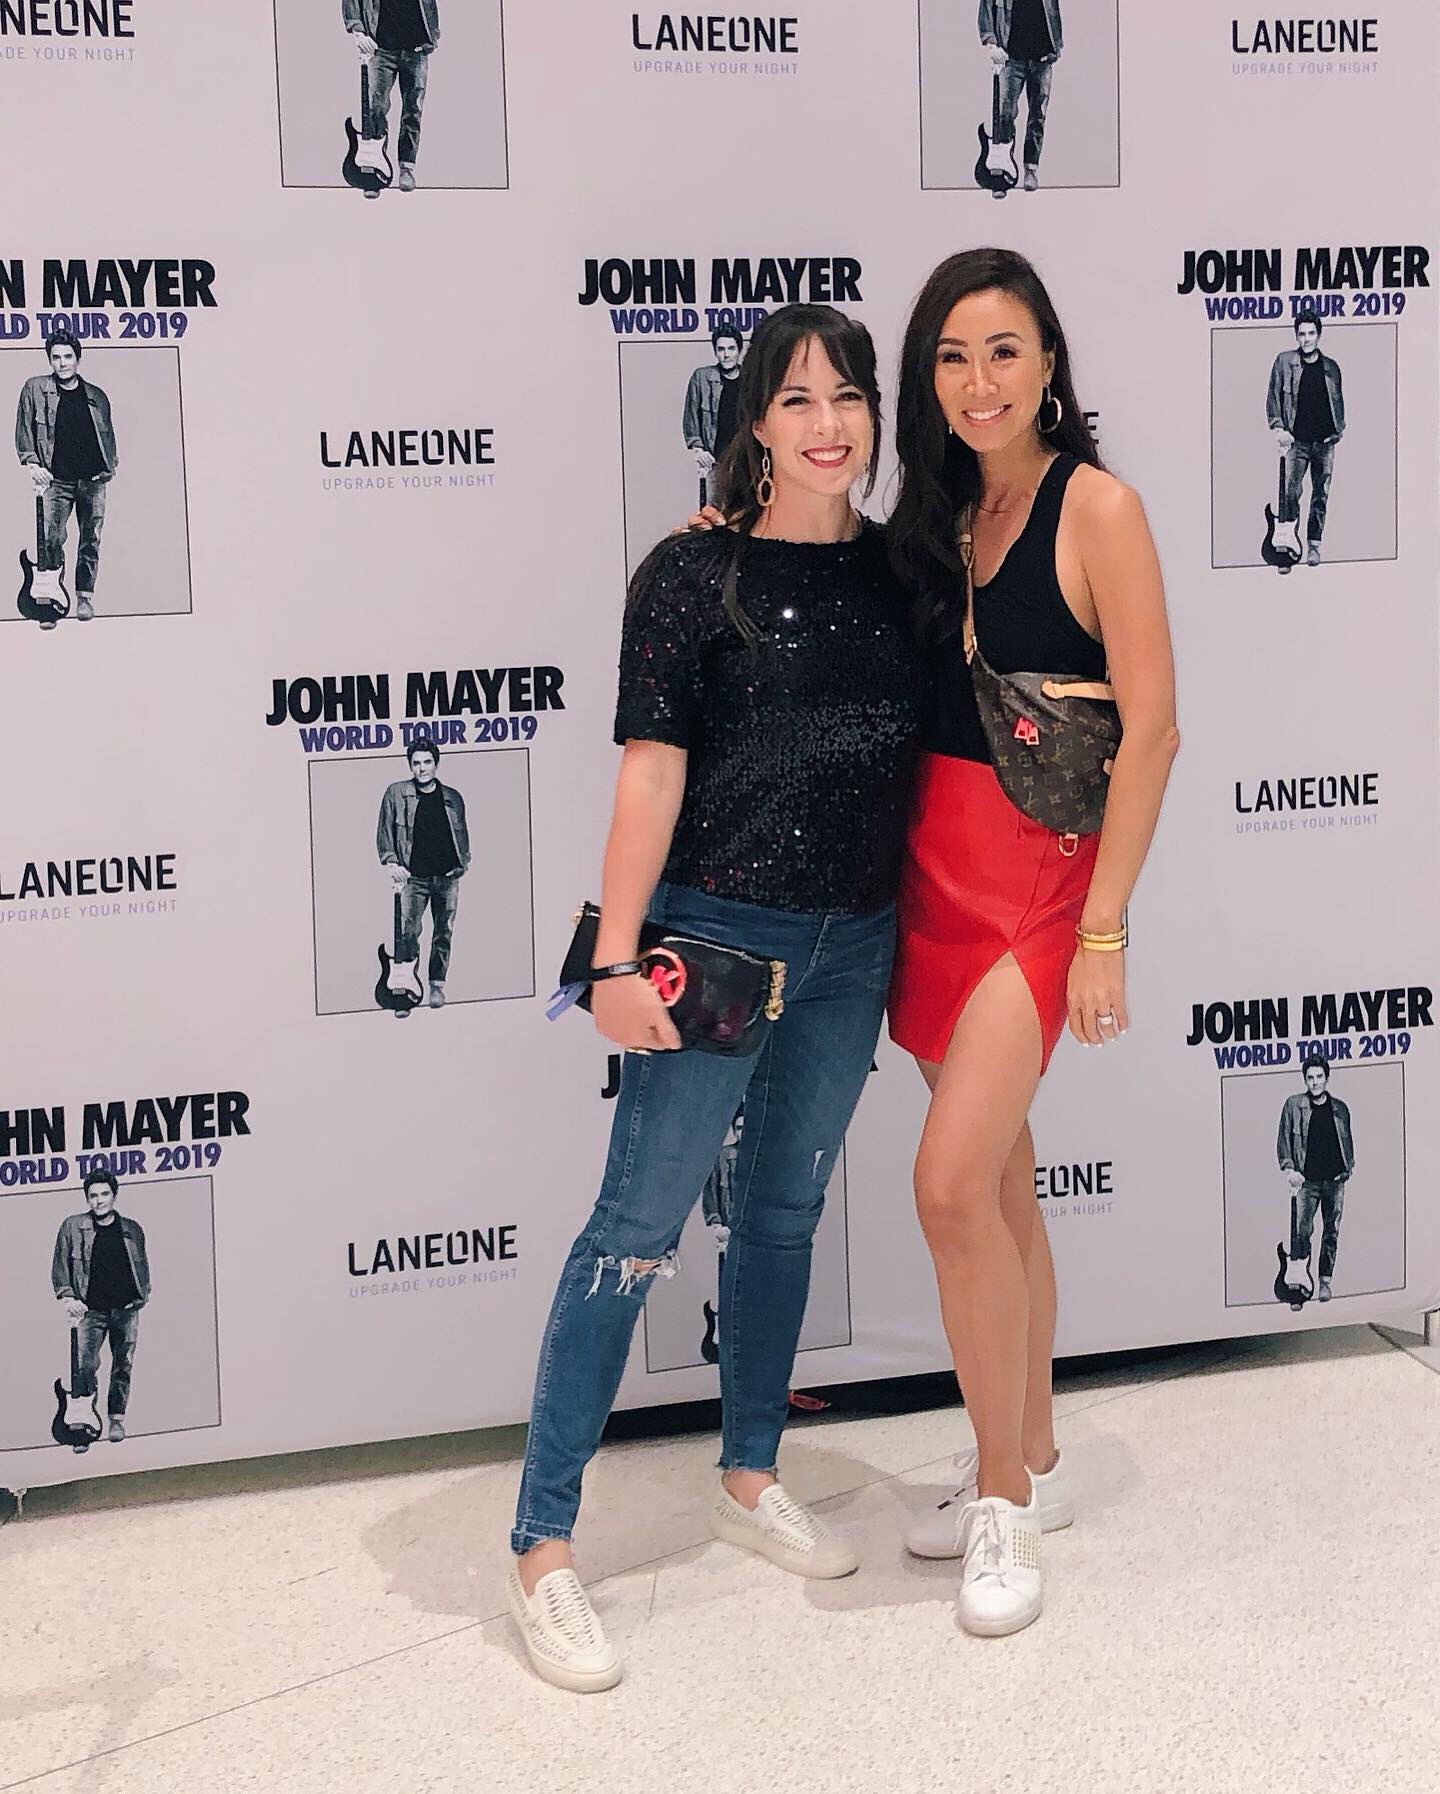 John Mayer world tour 2019 phoenix